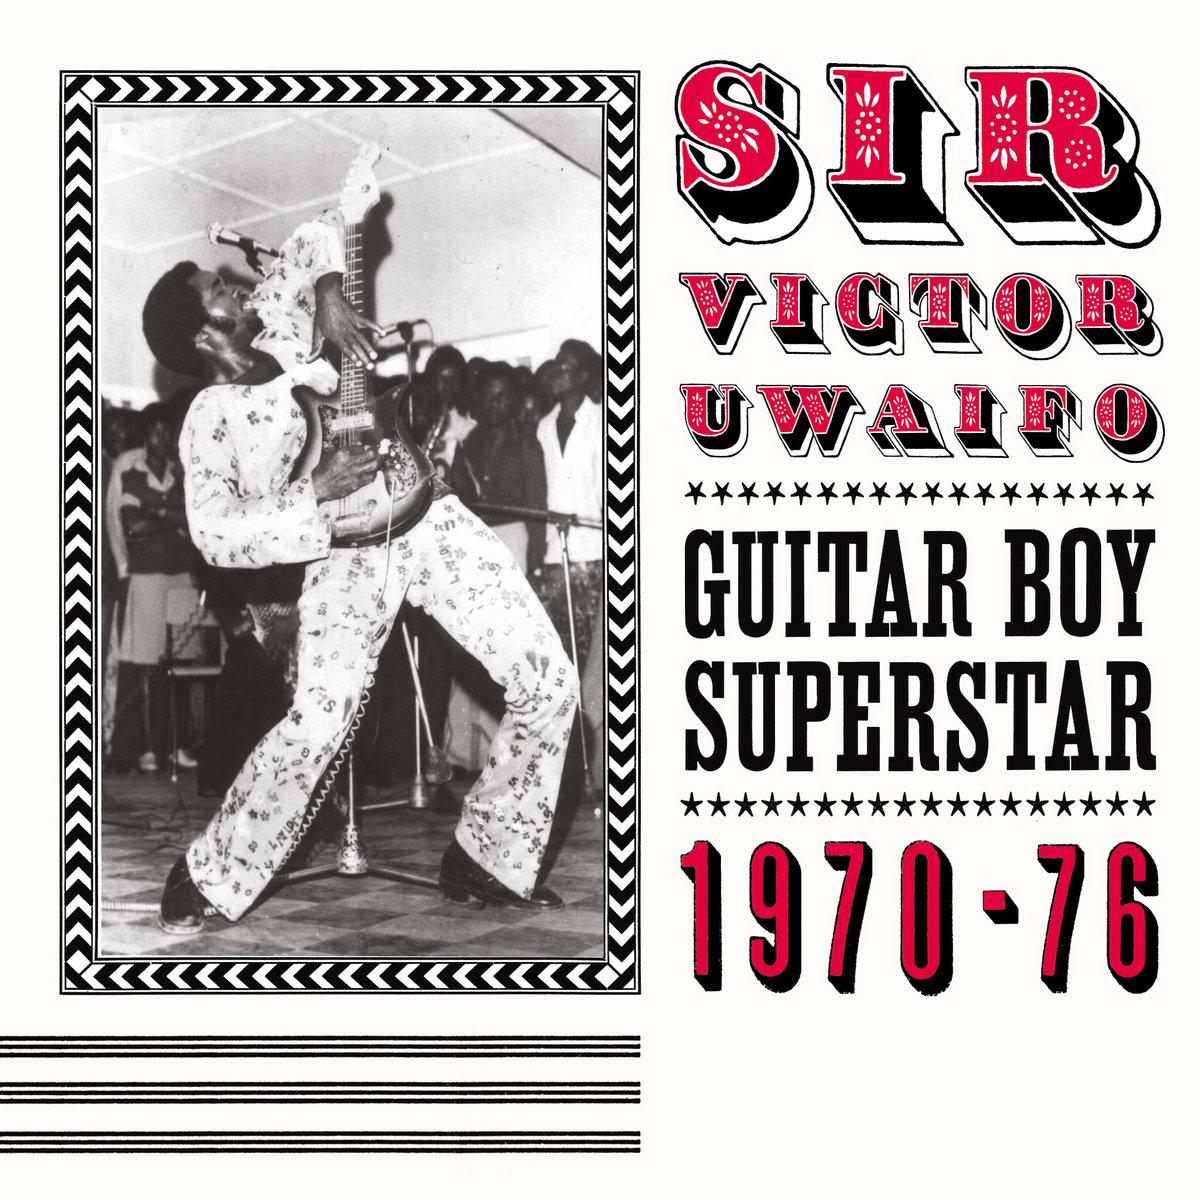 Sir Victor Uwaifo - Guitar Boy Superstar